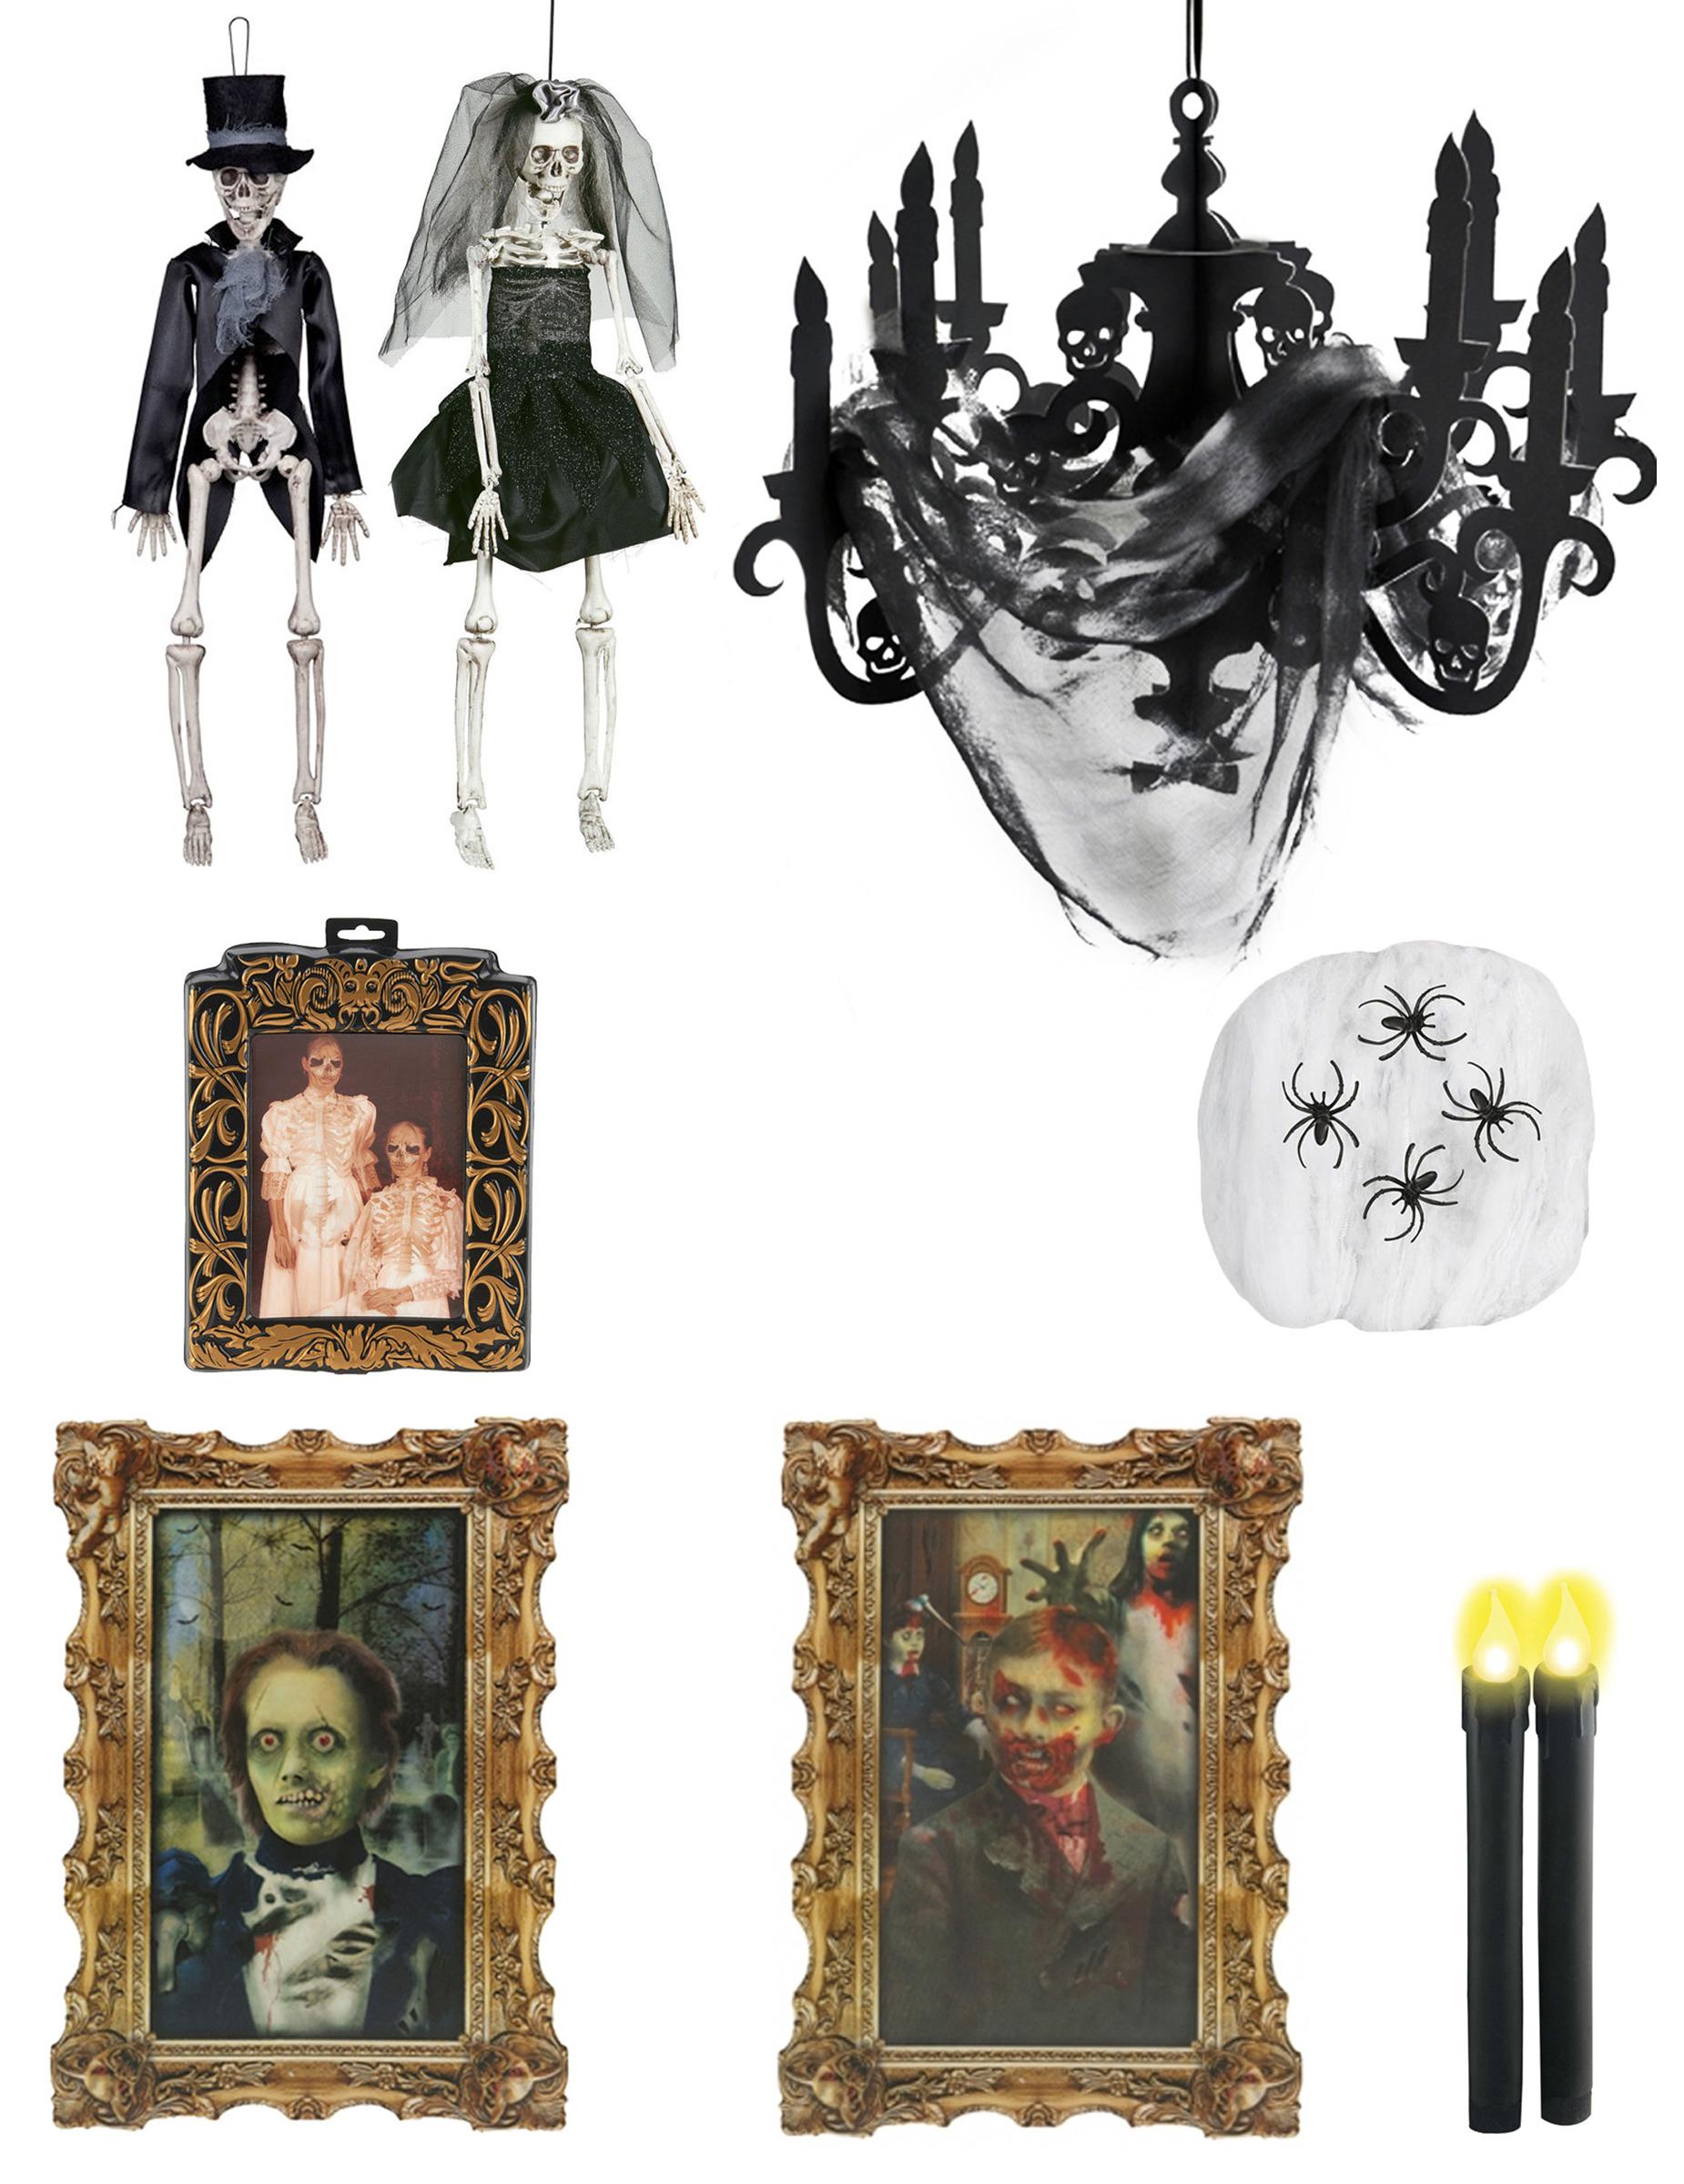 pack maison hant e standard halloween deguise toi achat de decoration animation. Black Bedroom Furniture Sets. Home Design Ideas